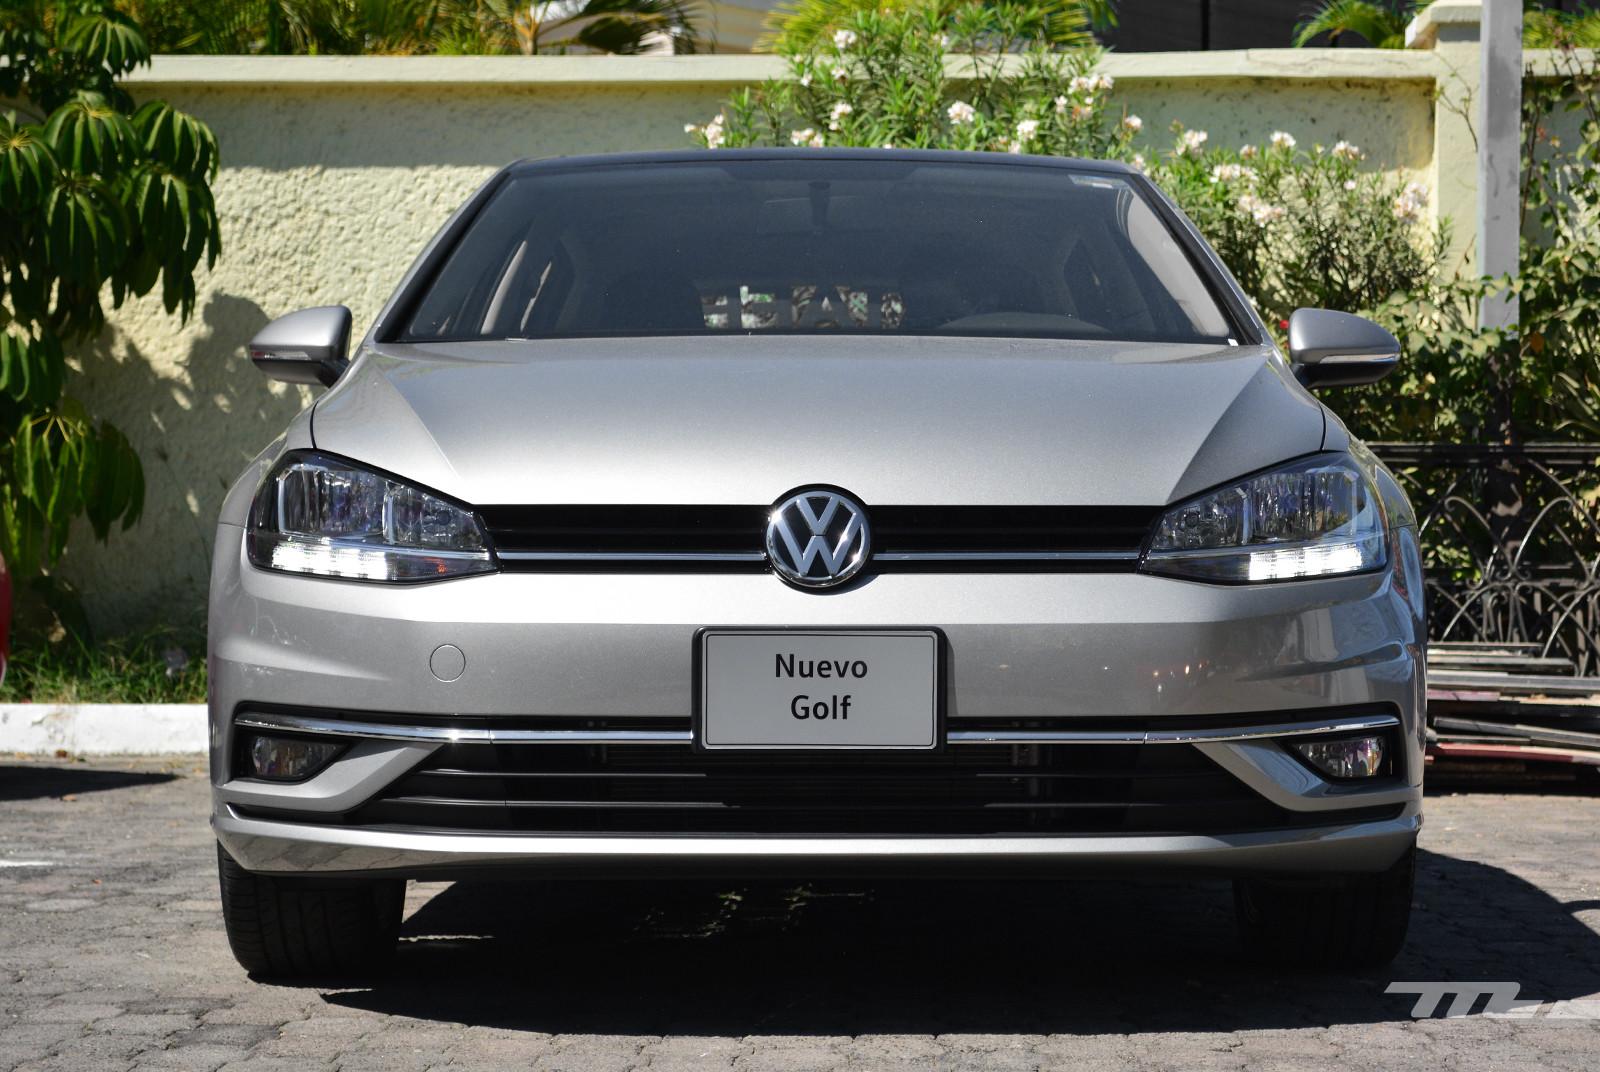 Foto de Volkswagen Golf y Golf GTI 2018 (5/24)